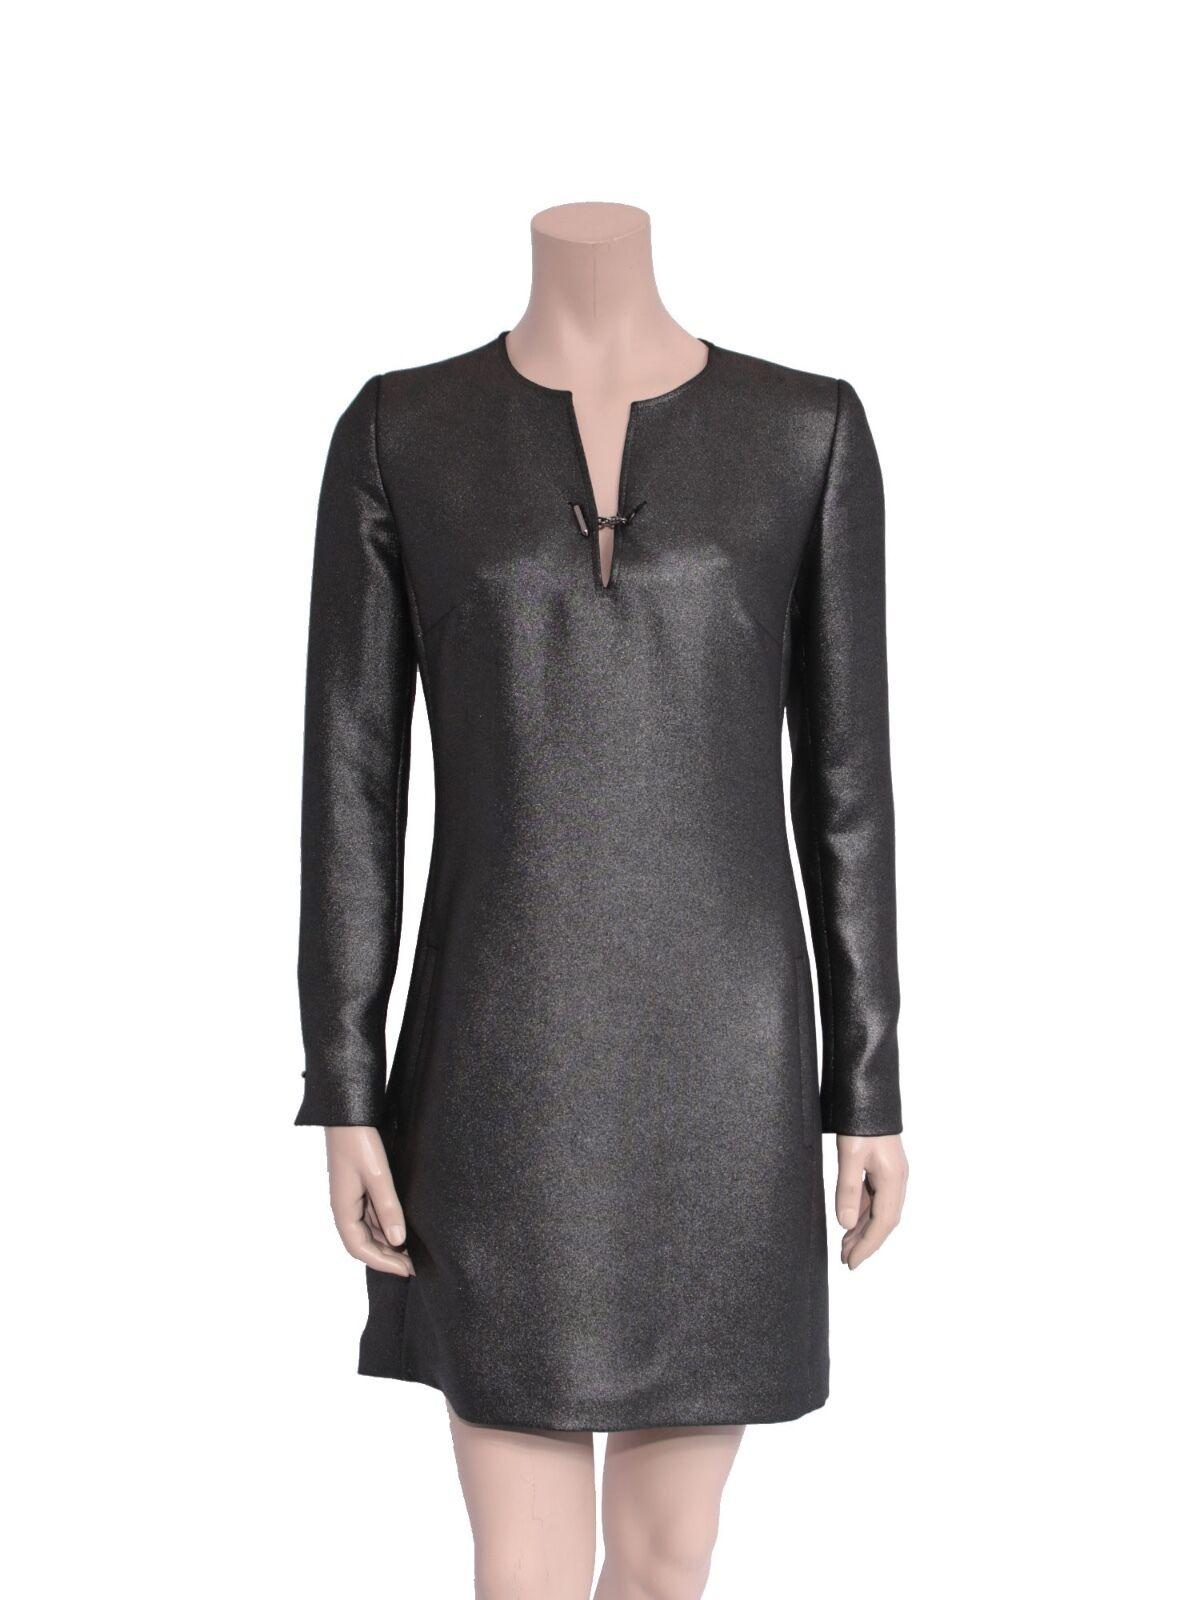 BARBARA BUI Metallic Shift Dress (SIZE 38)